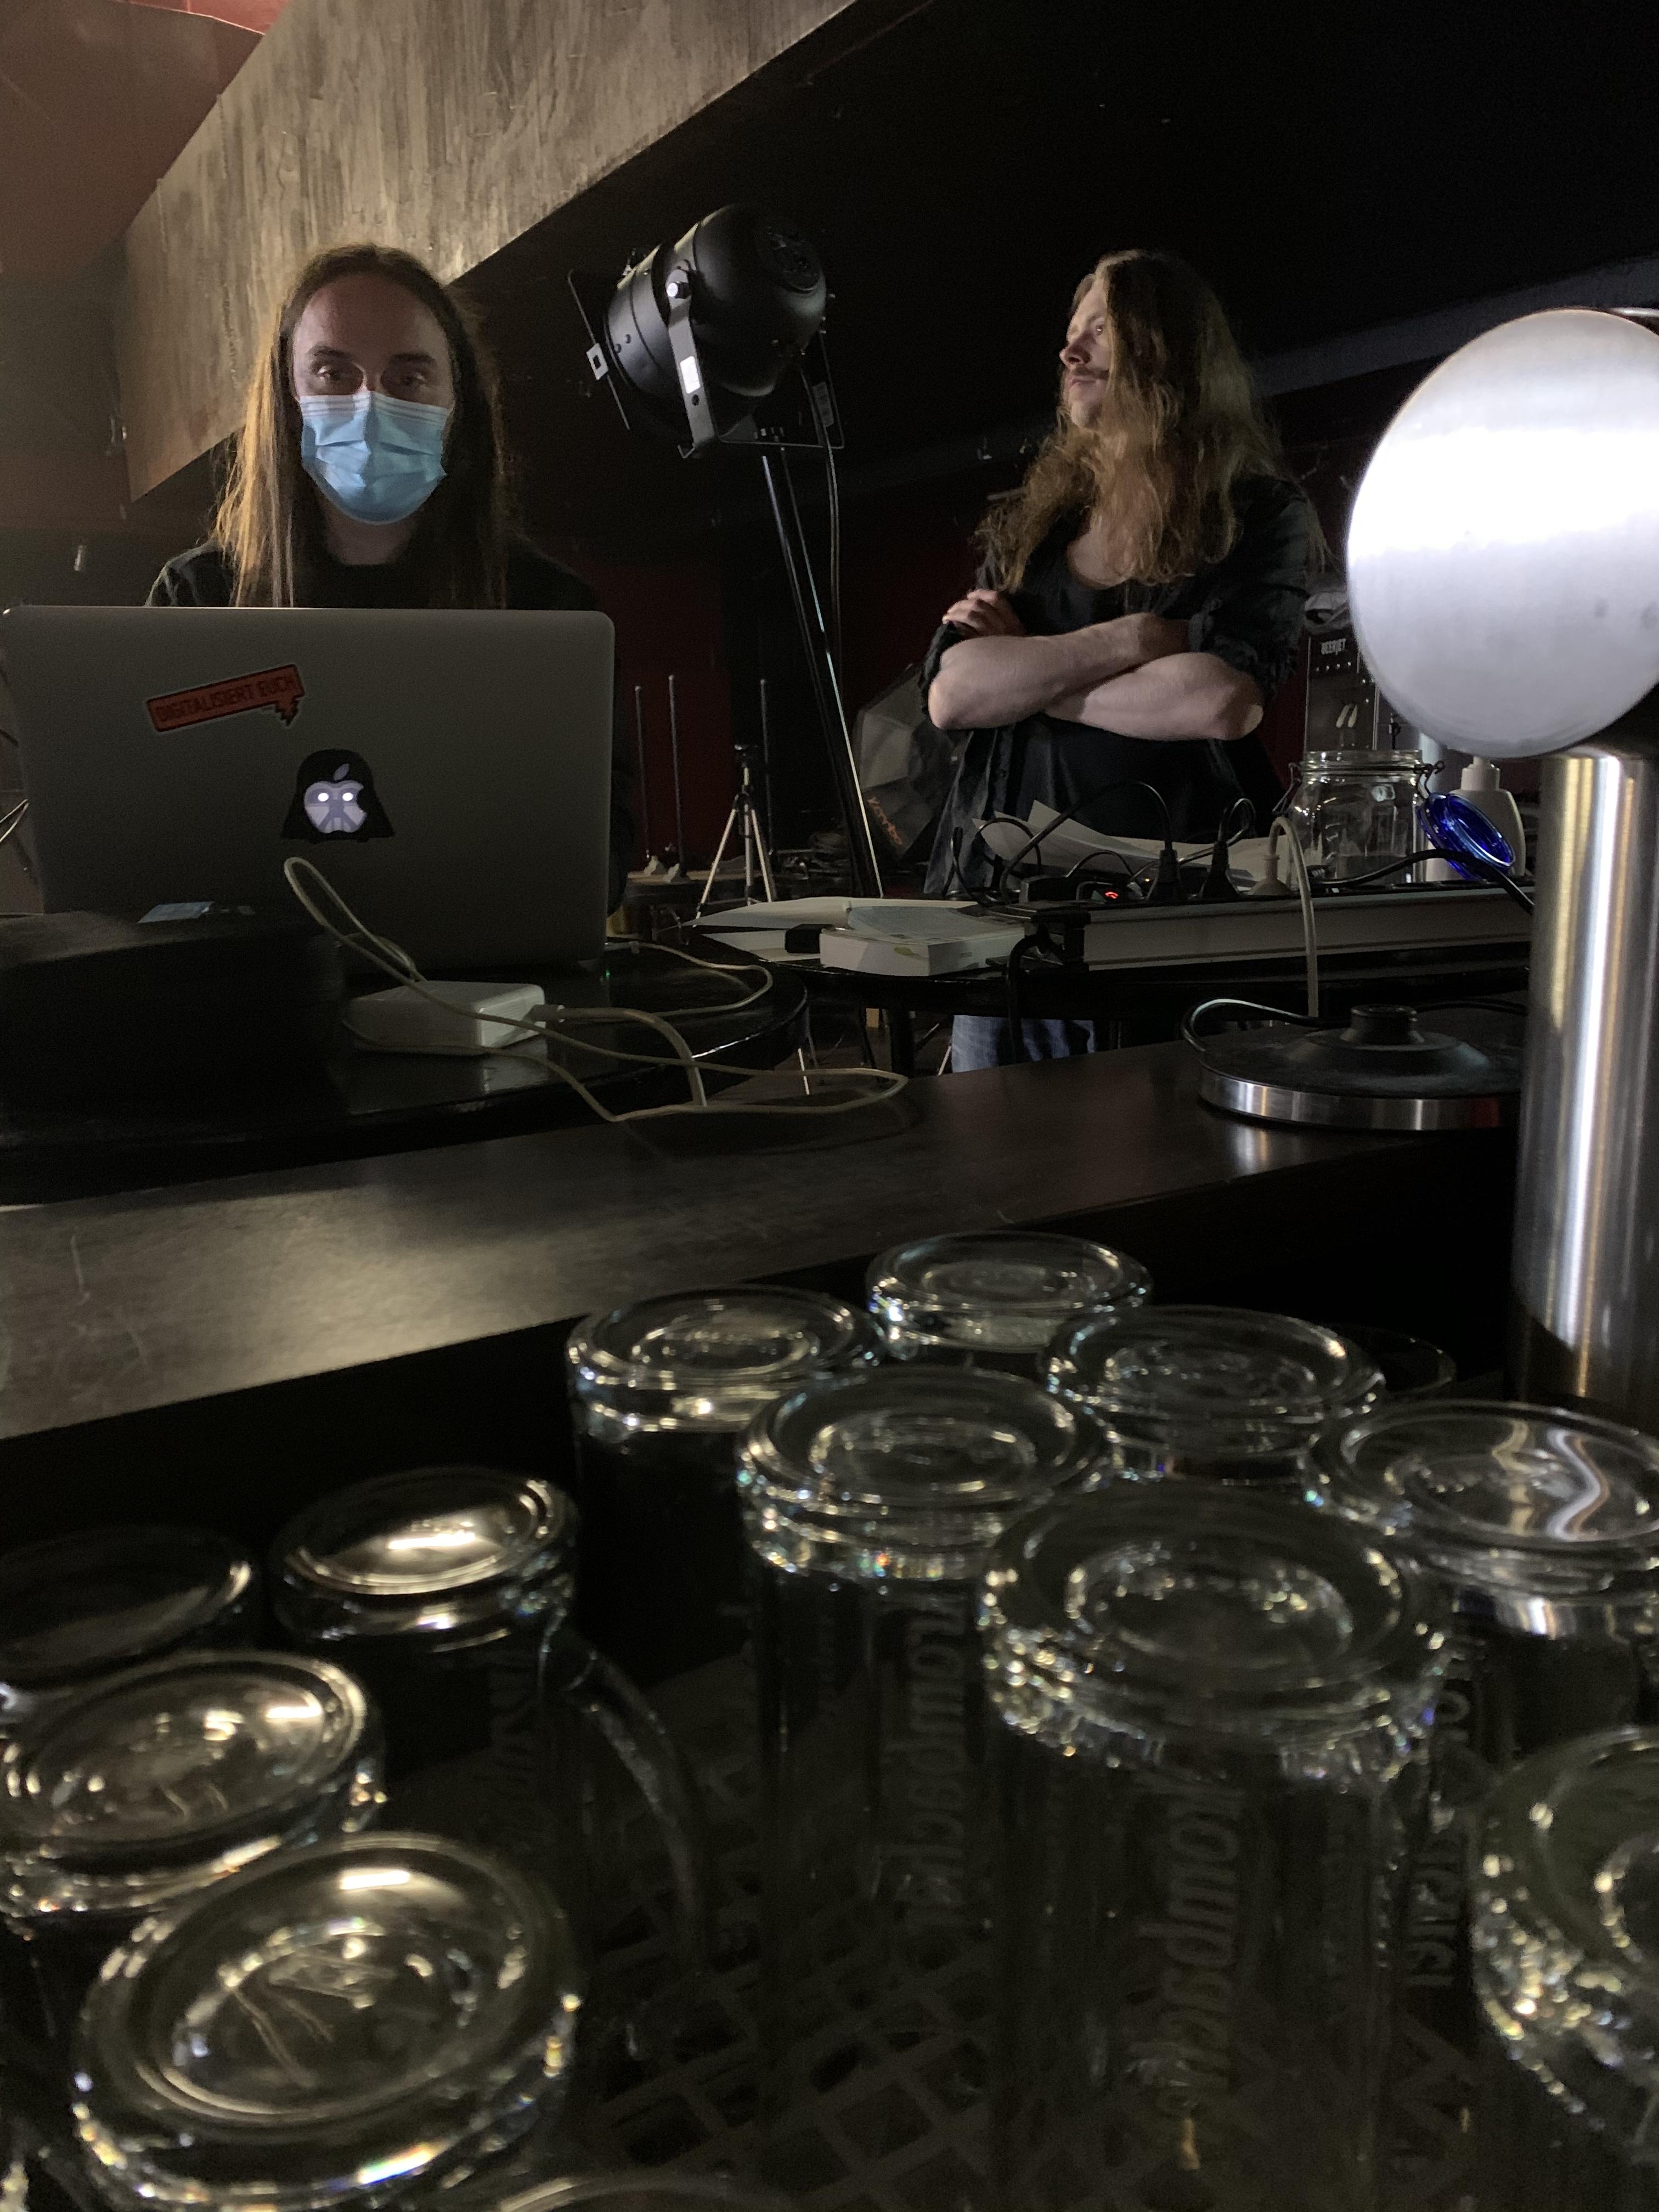 The-Very-End-Metal-Video-Shoot-behind-the-scenes_5339